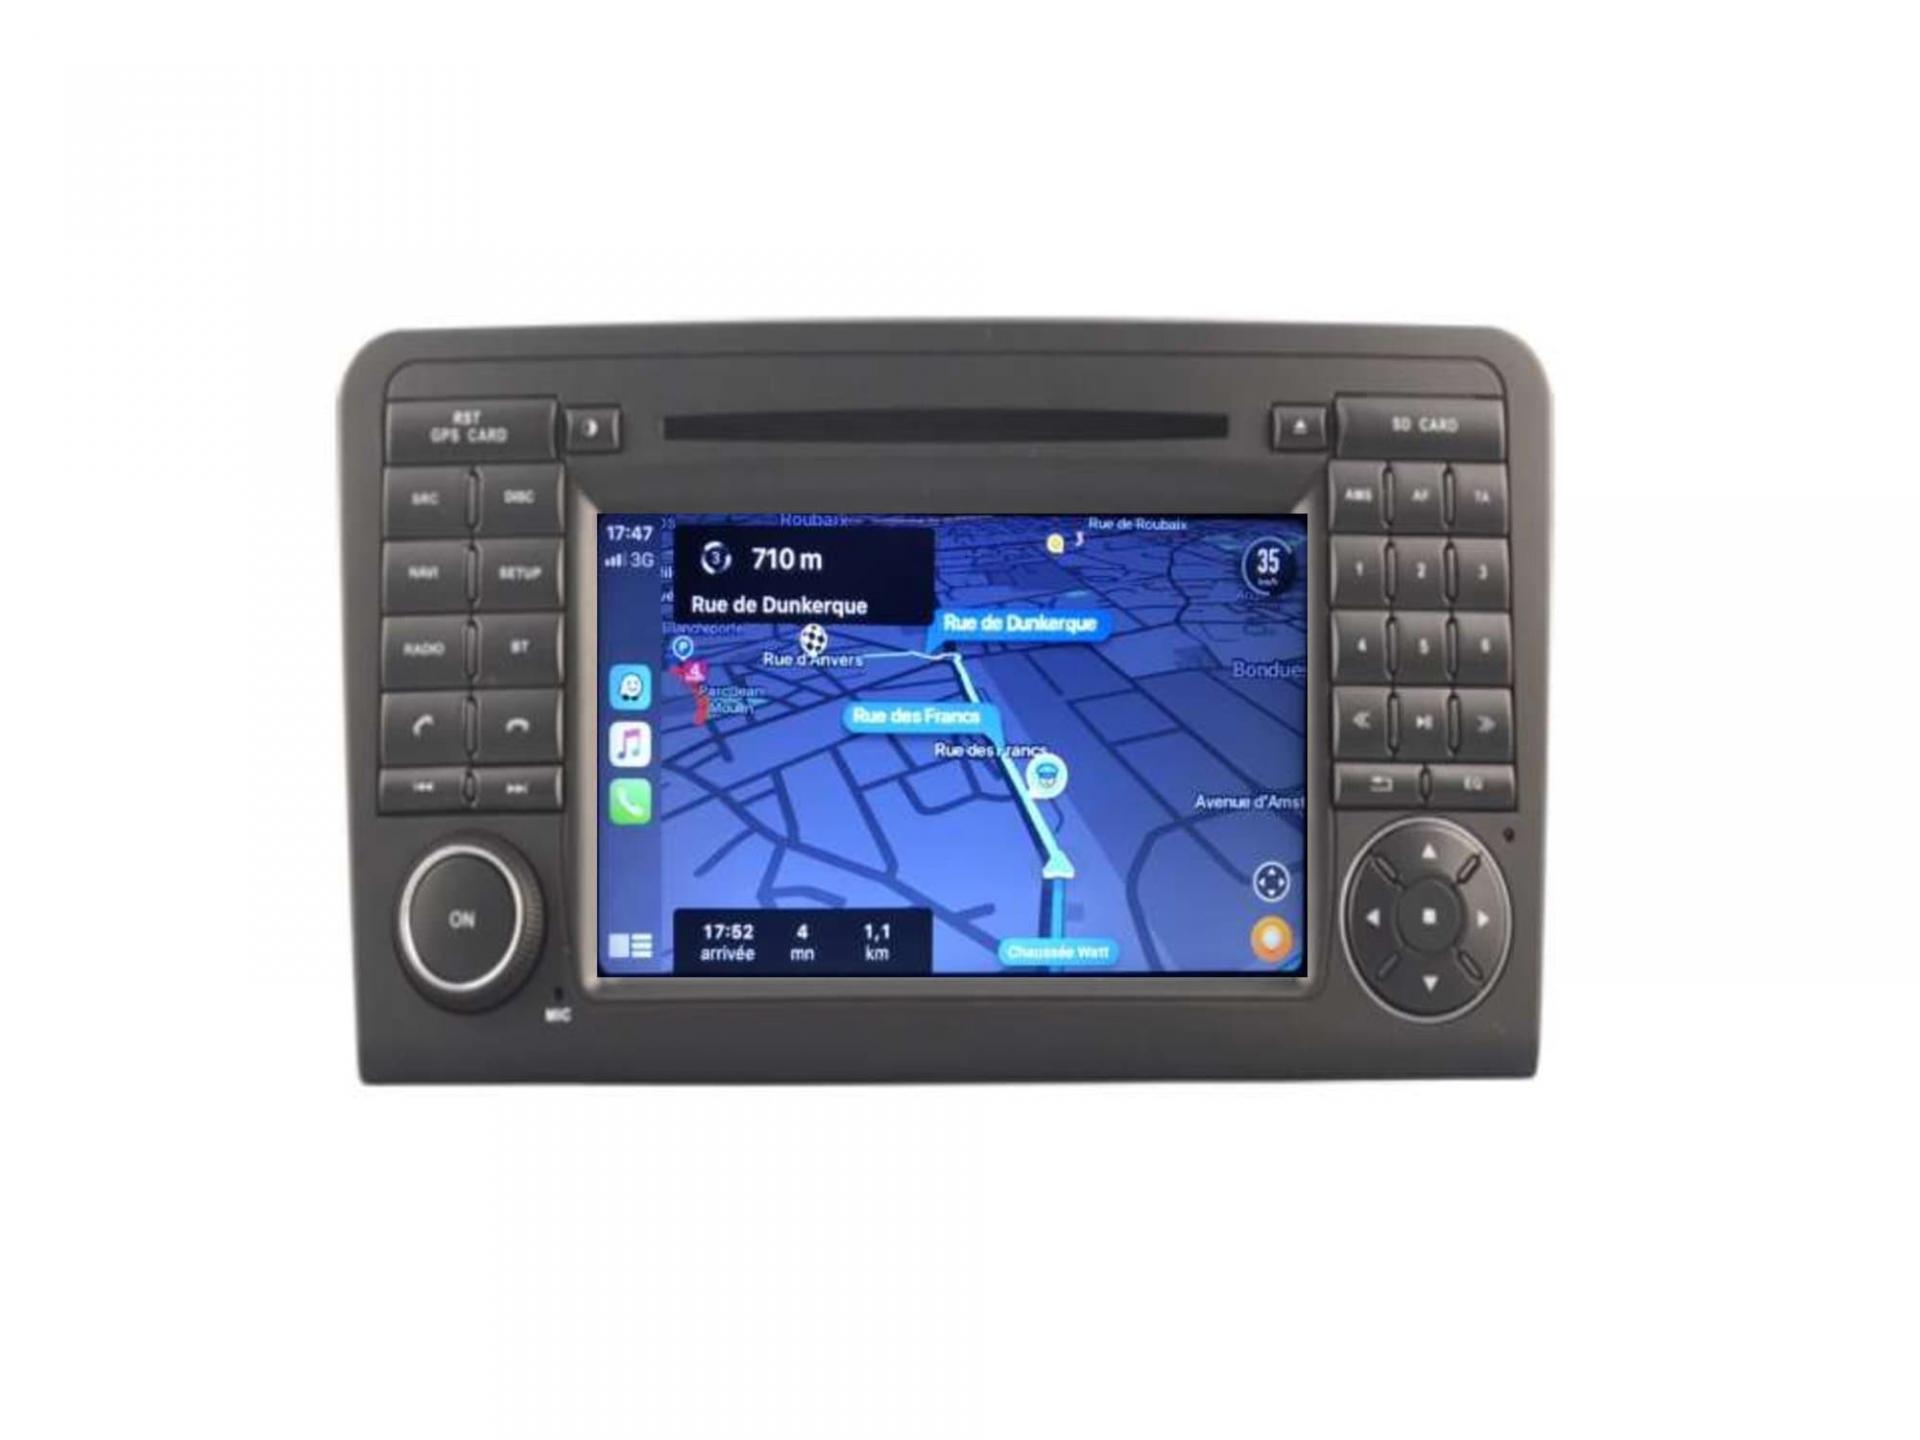 Autoradio gps carplay android auto gps bluetooth mercedes ml w164 1